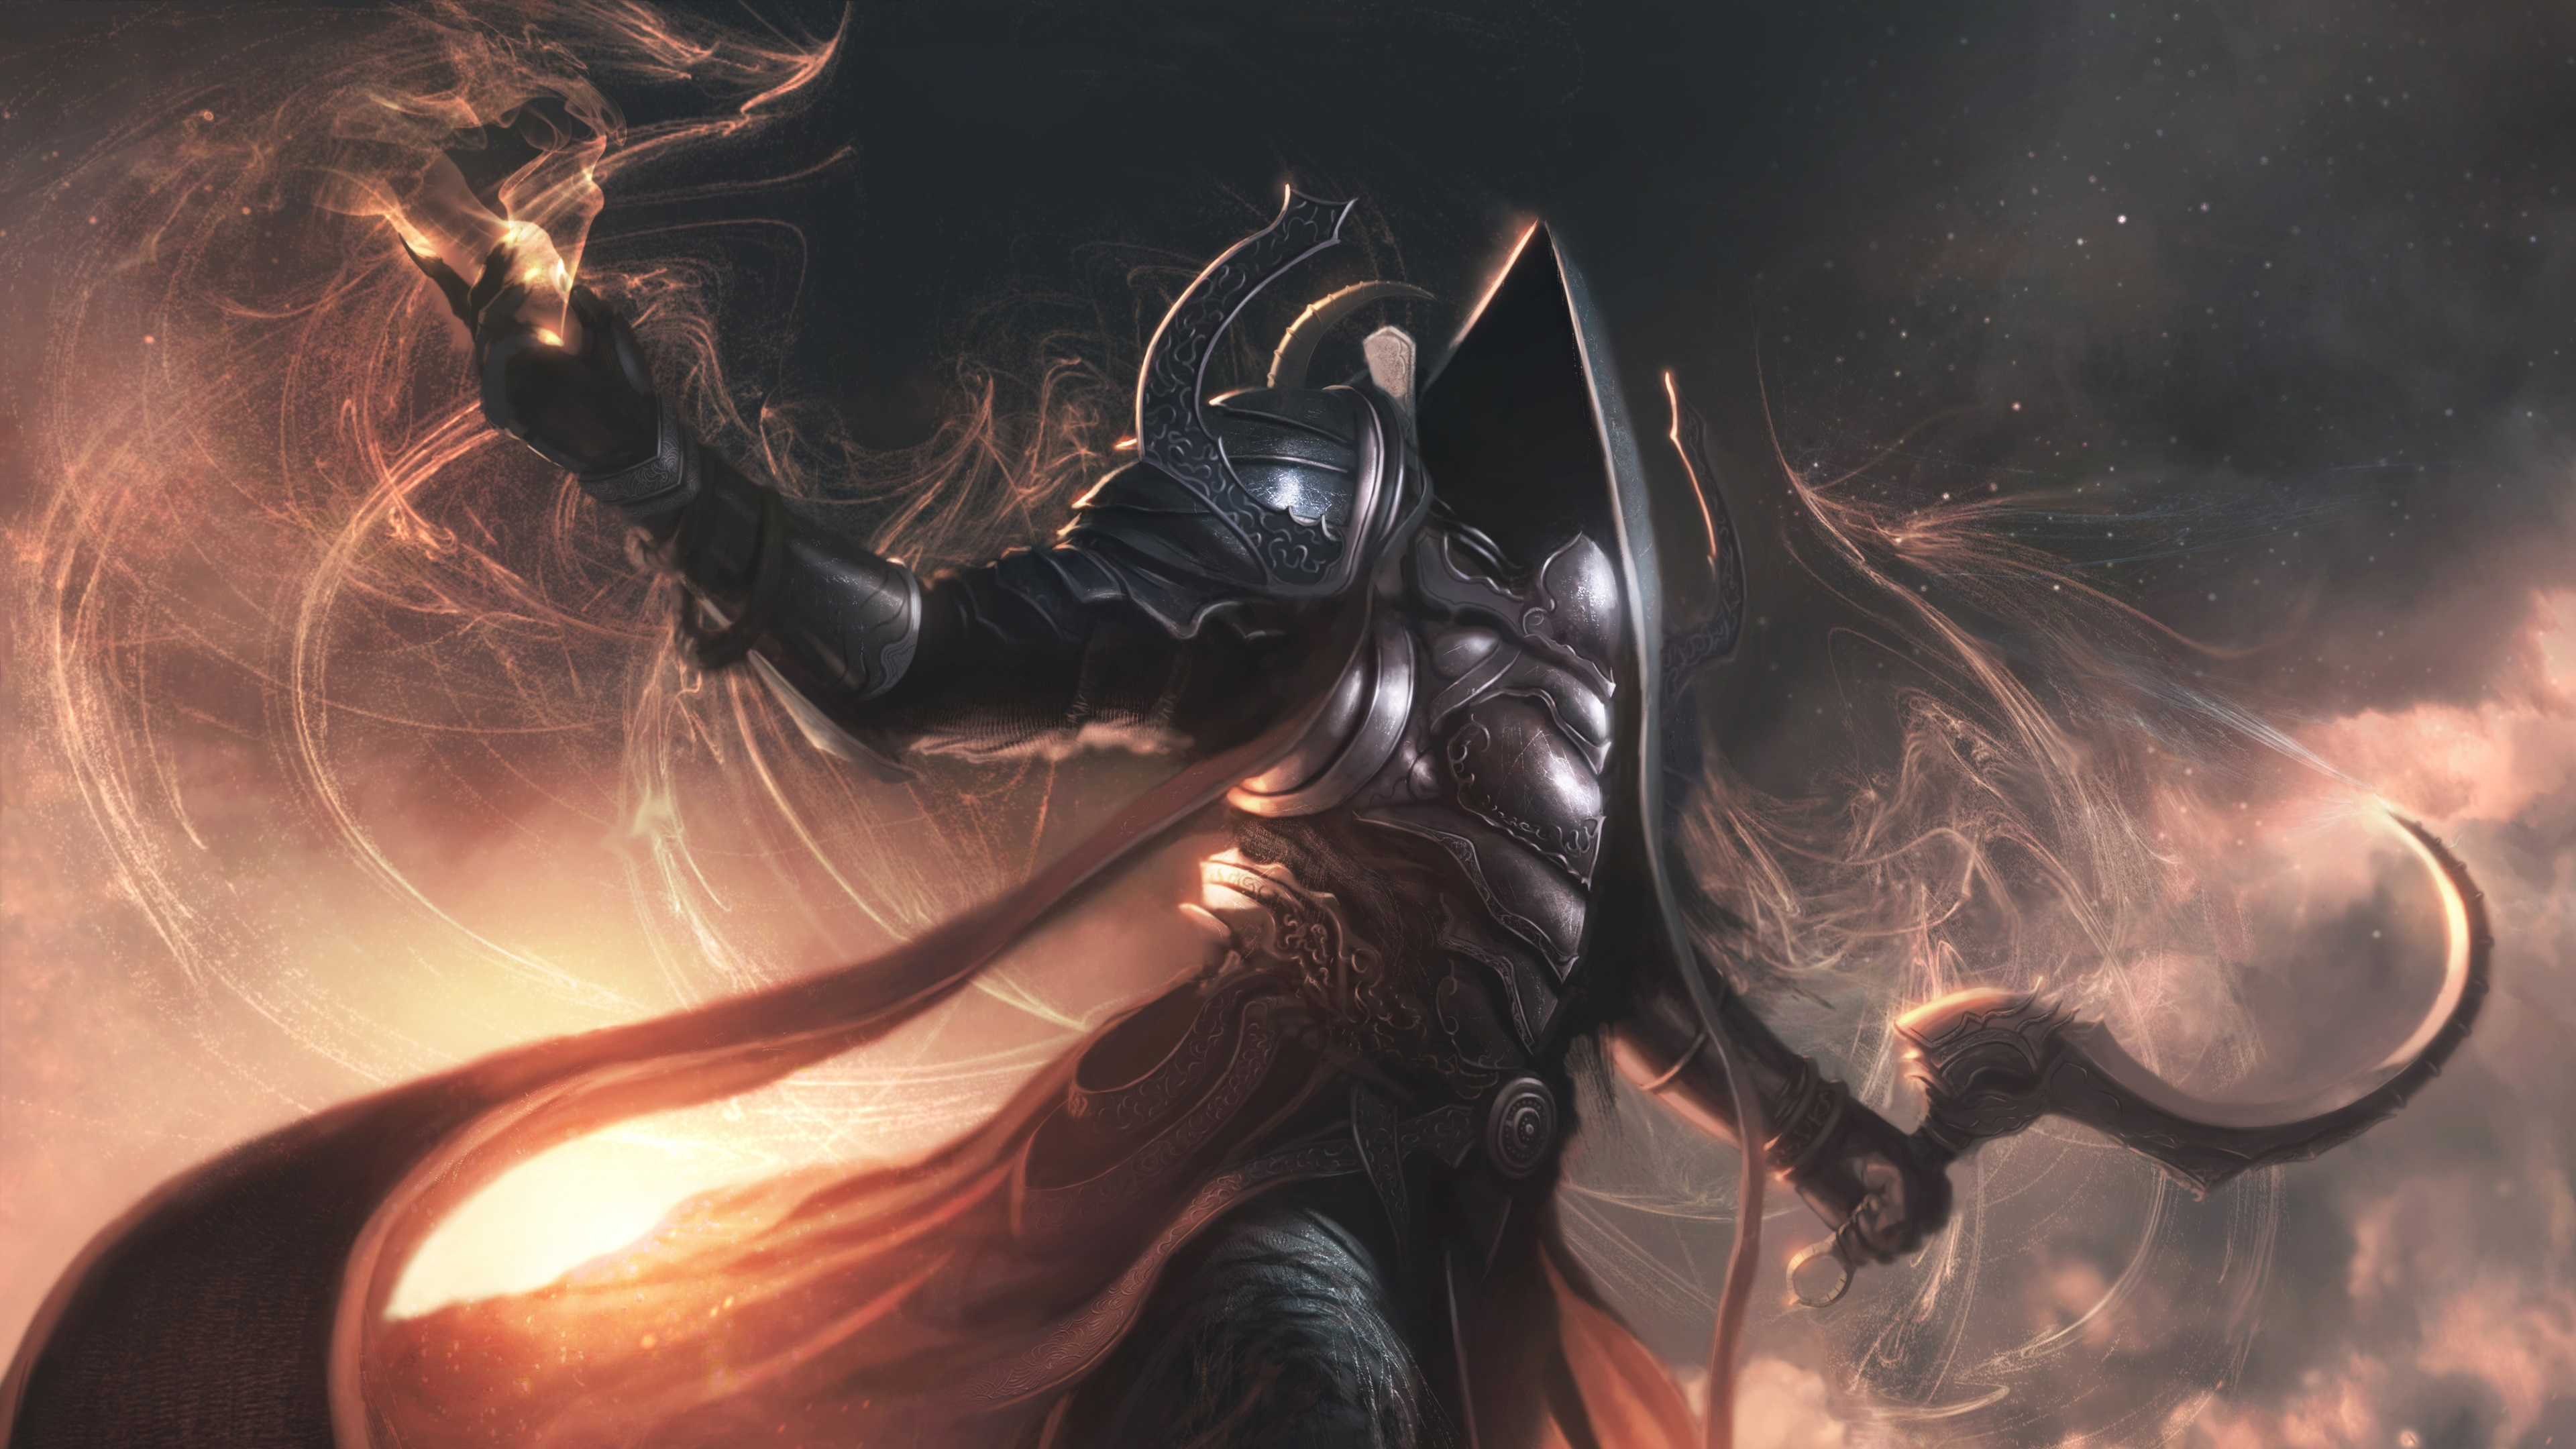 Wallpaper Diablo 3 Reaper Of Souls 3840x2160 Uhd 4k Picture Image